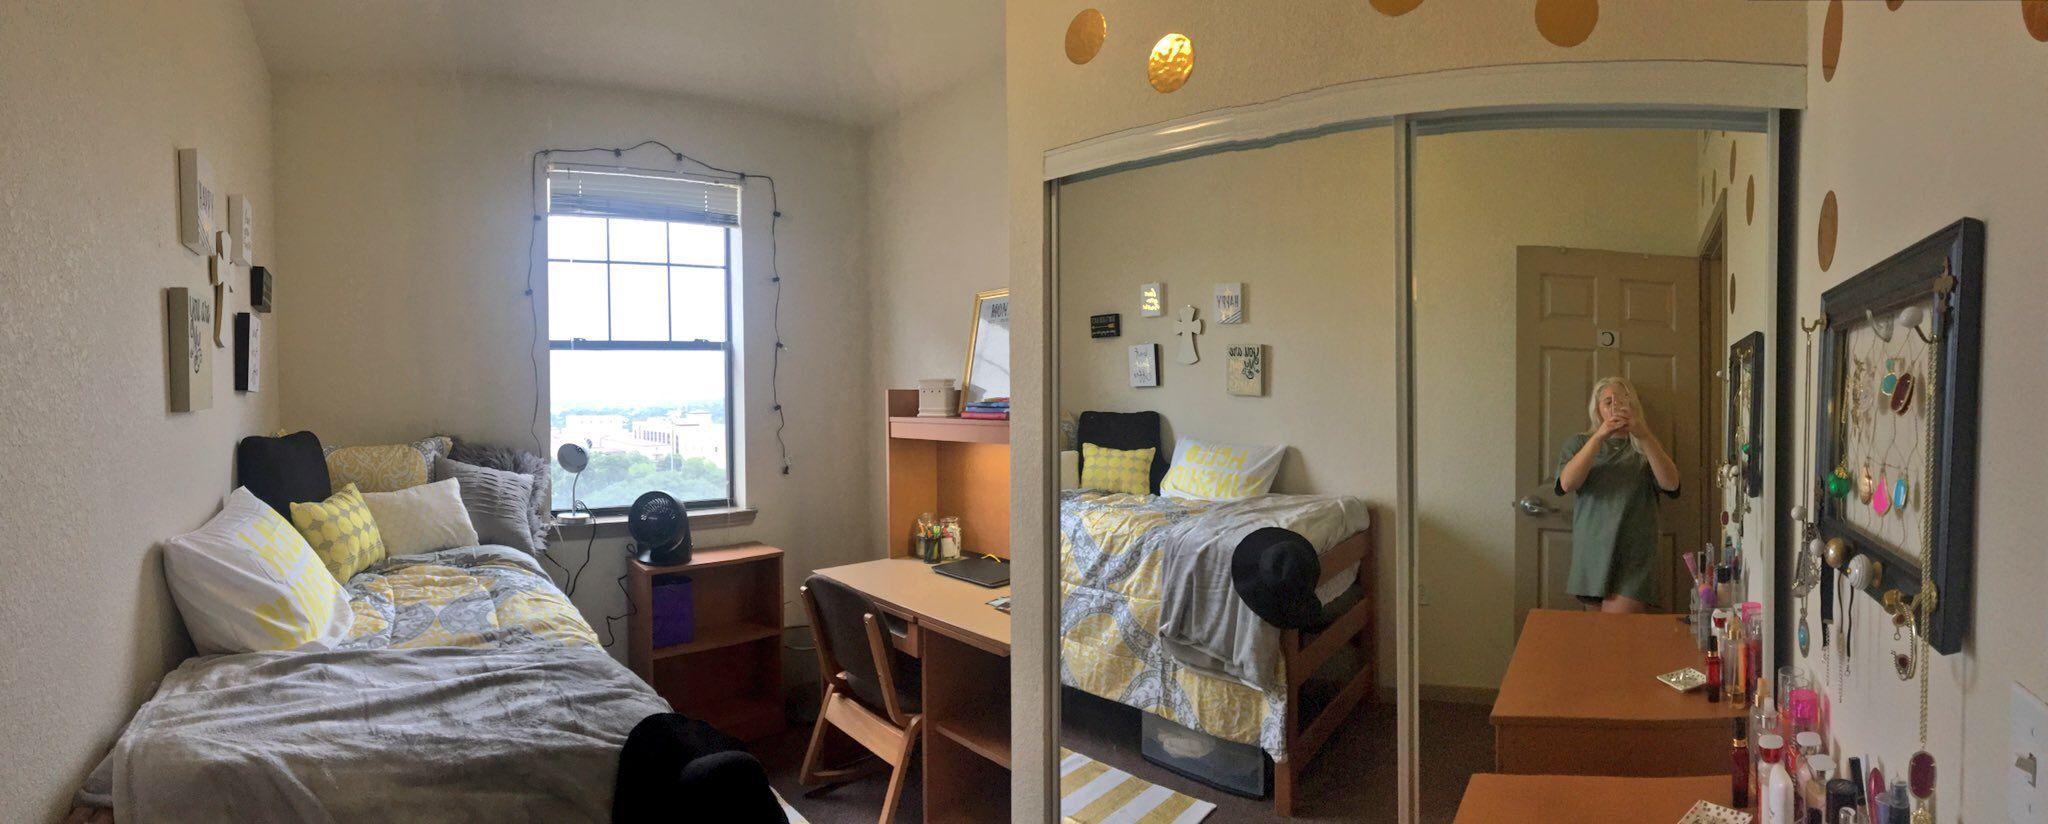 Texas State University San Jacinto Hall Dorm C Texas State University Texas State Dorm Guy Dorm Rooms